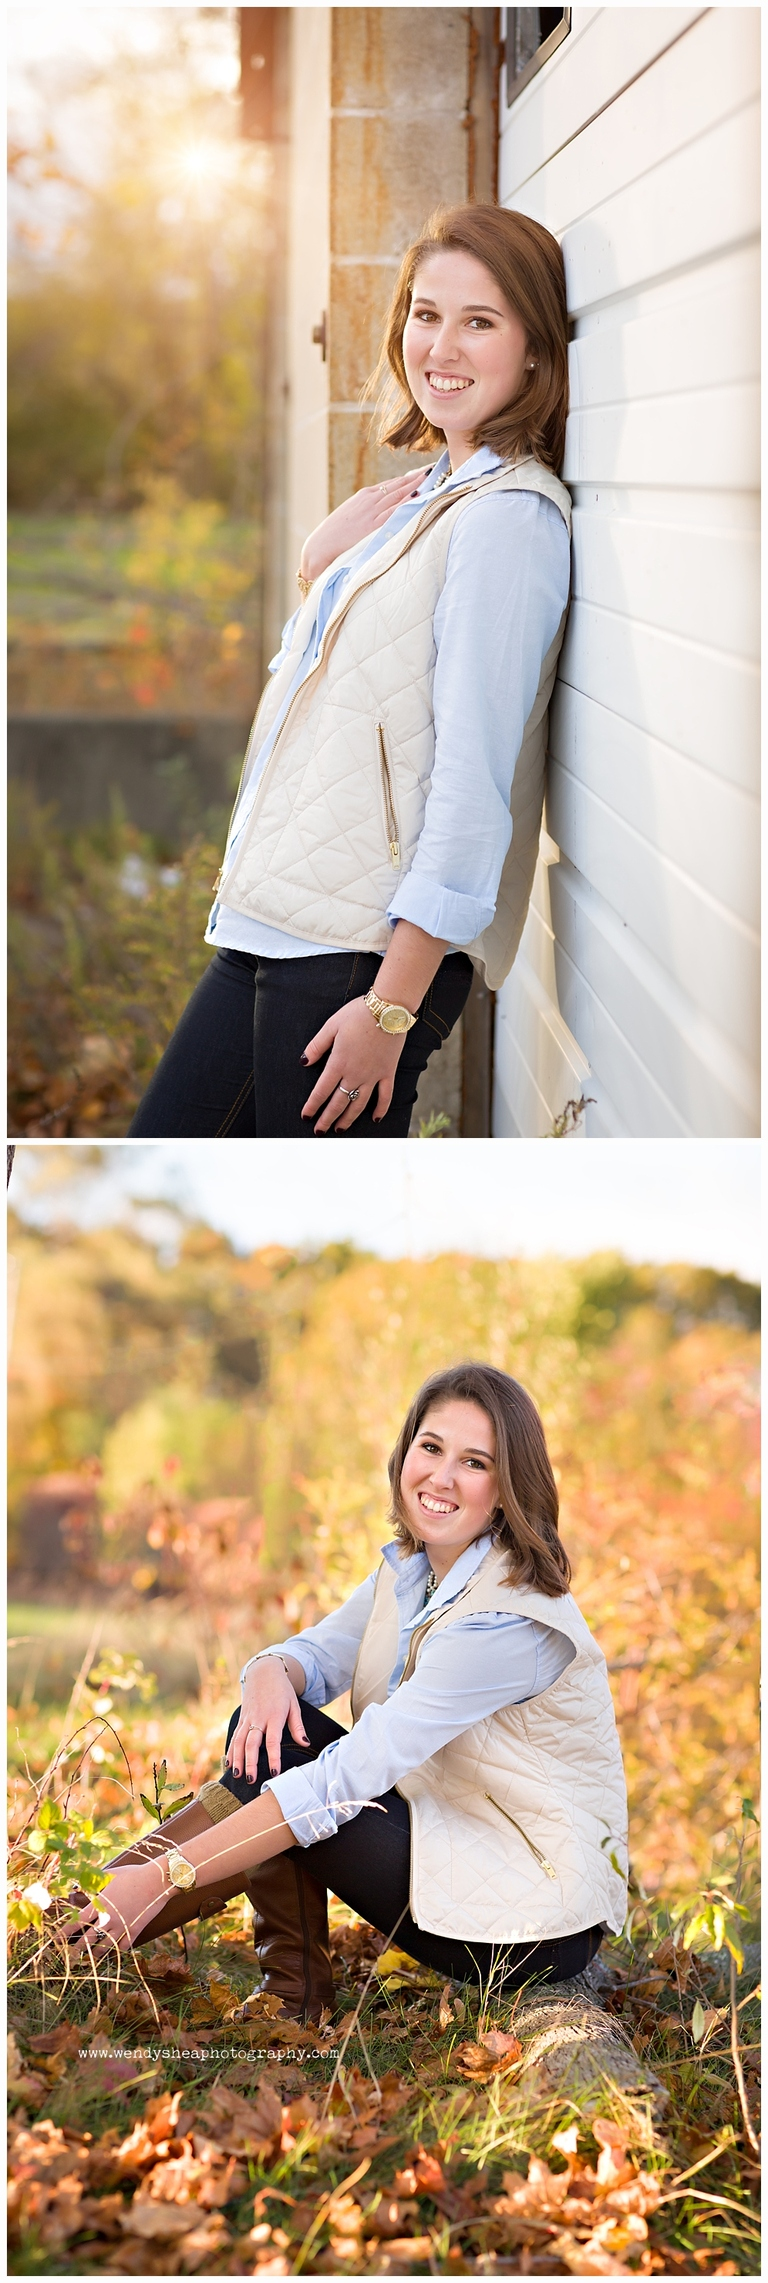 Wendy_Shea_Photography_Seniors_Massachusetts_Photographer_Medway__0962